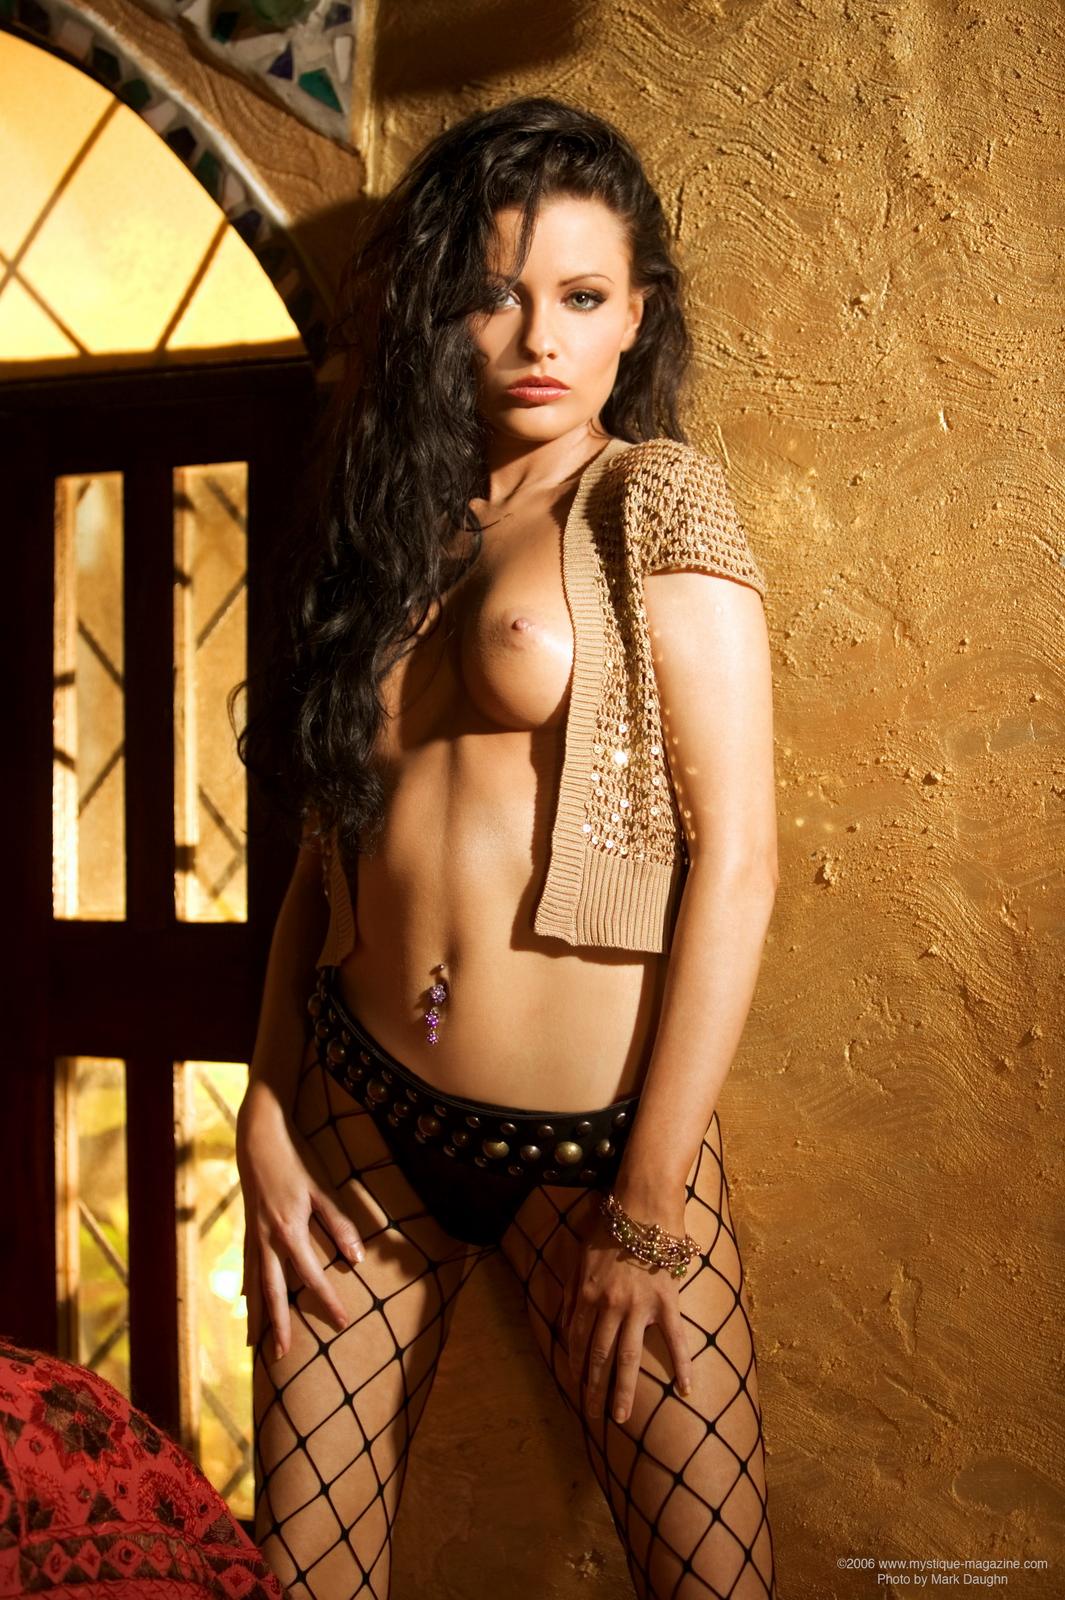 chrystal-lee-fishnet-pantyhose-naked-mystique-magazine-05